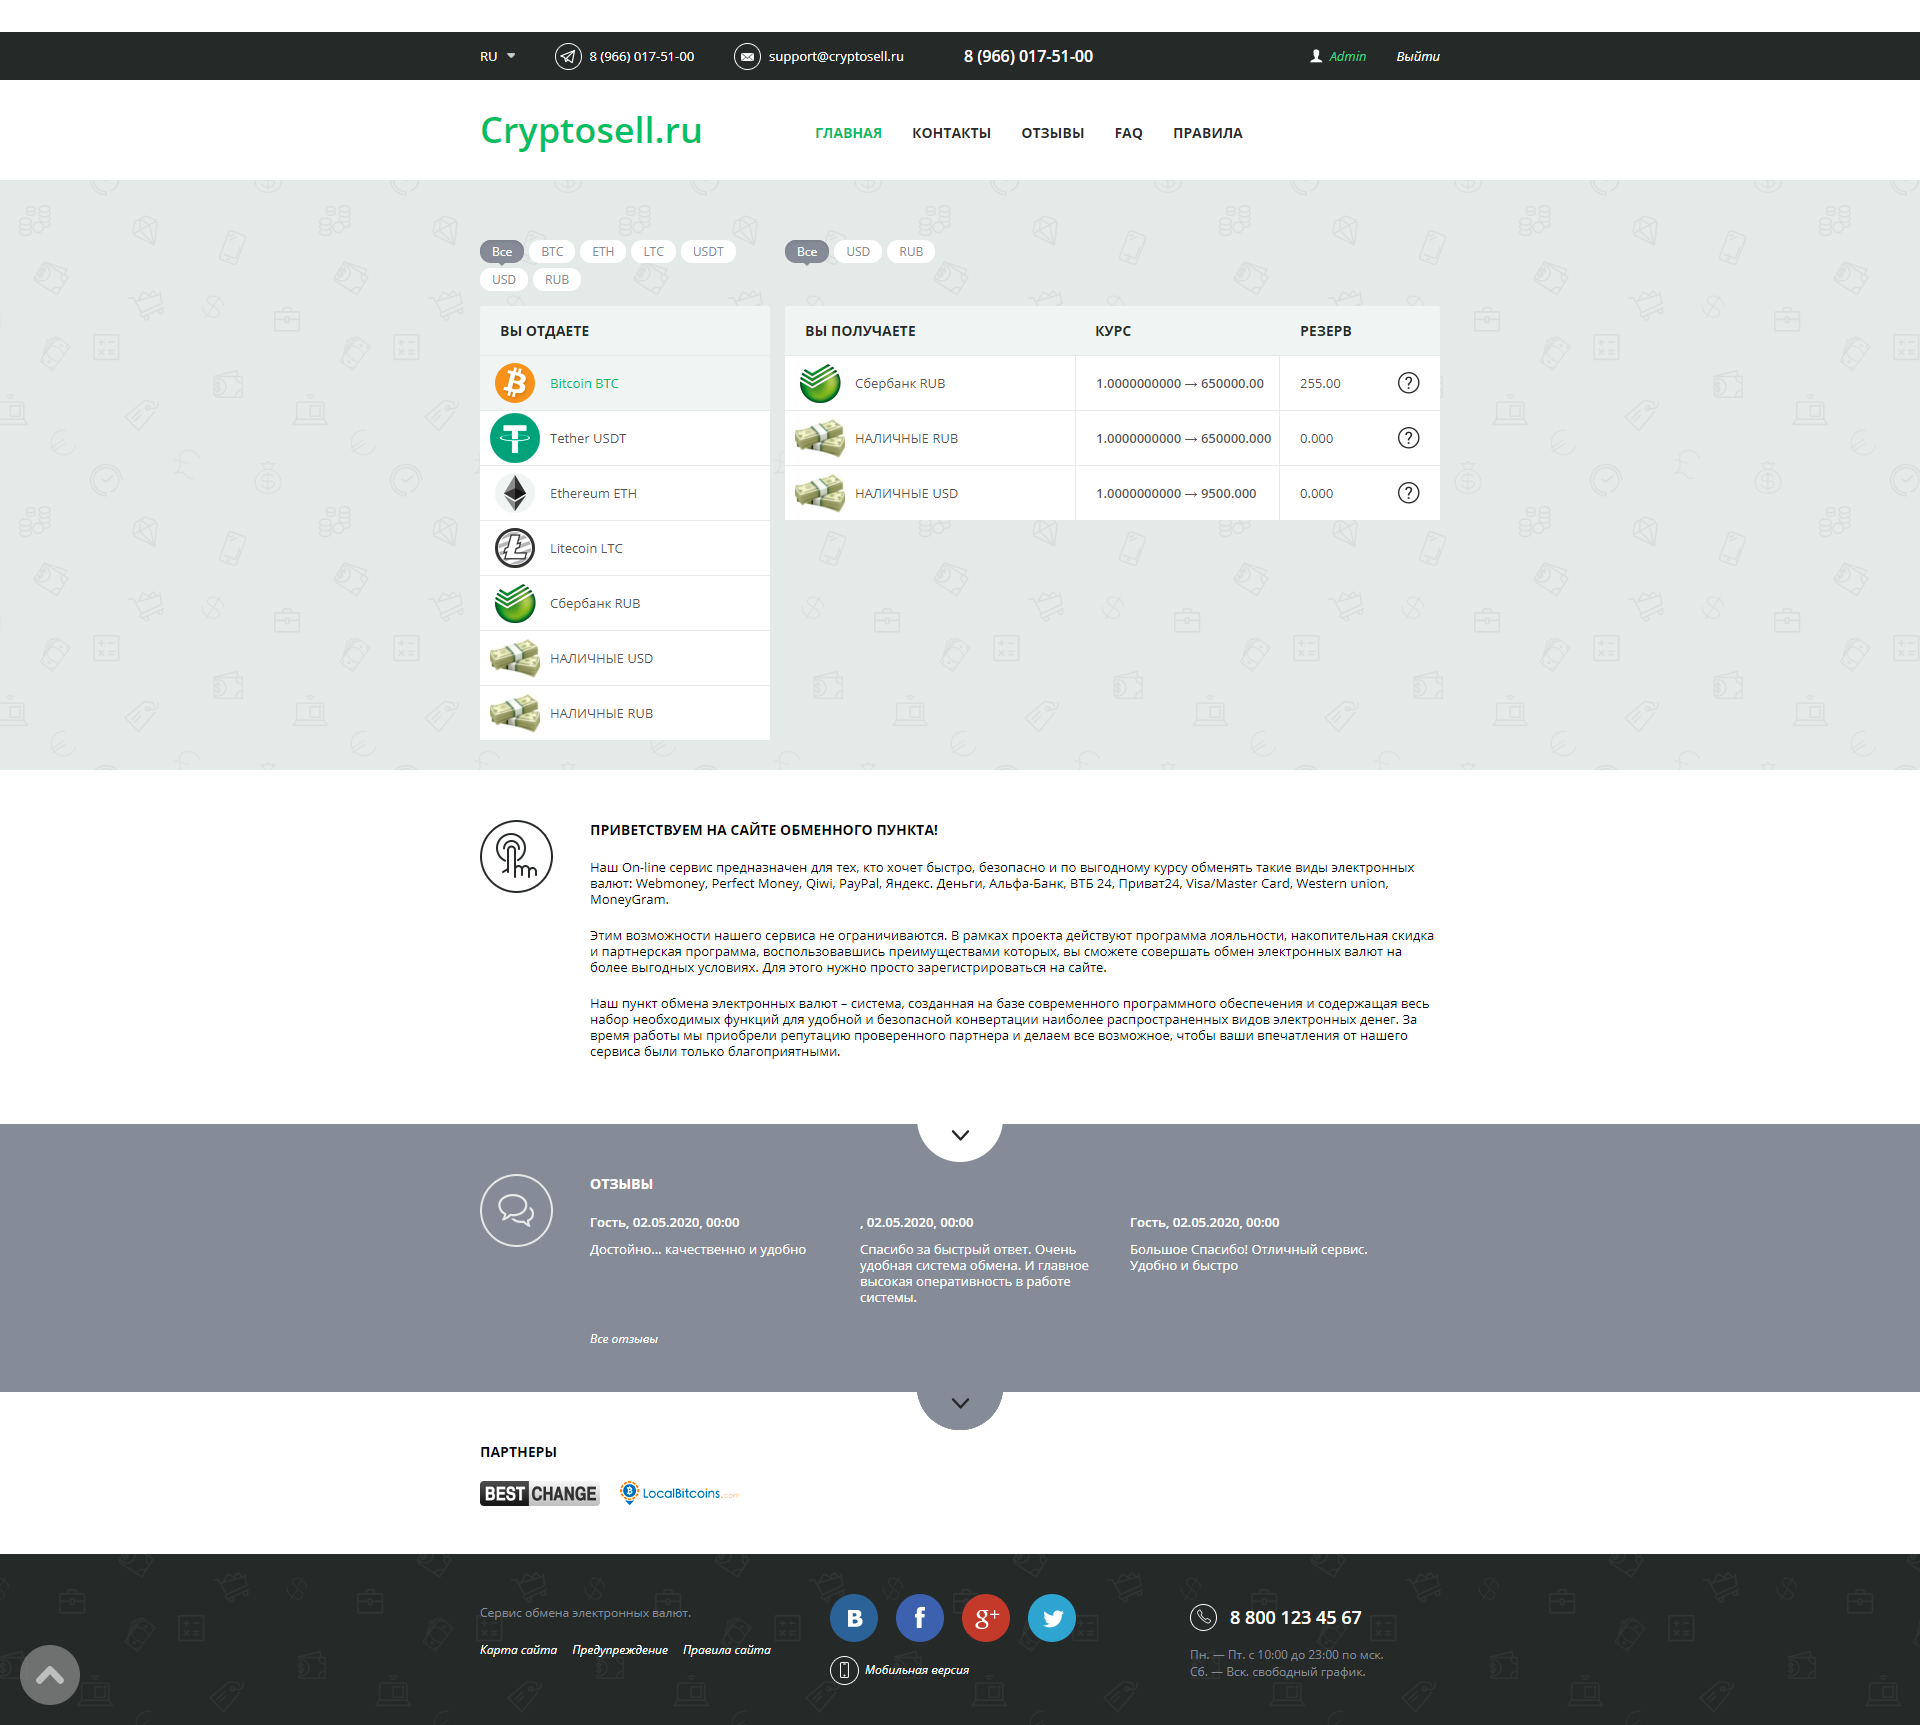 Redesign || Cryptosell.ru